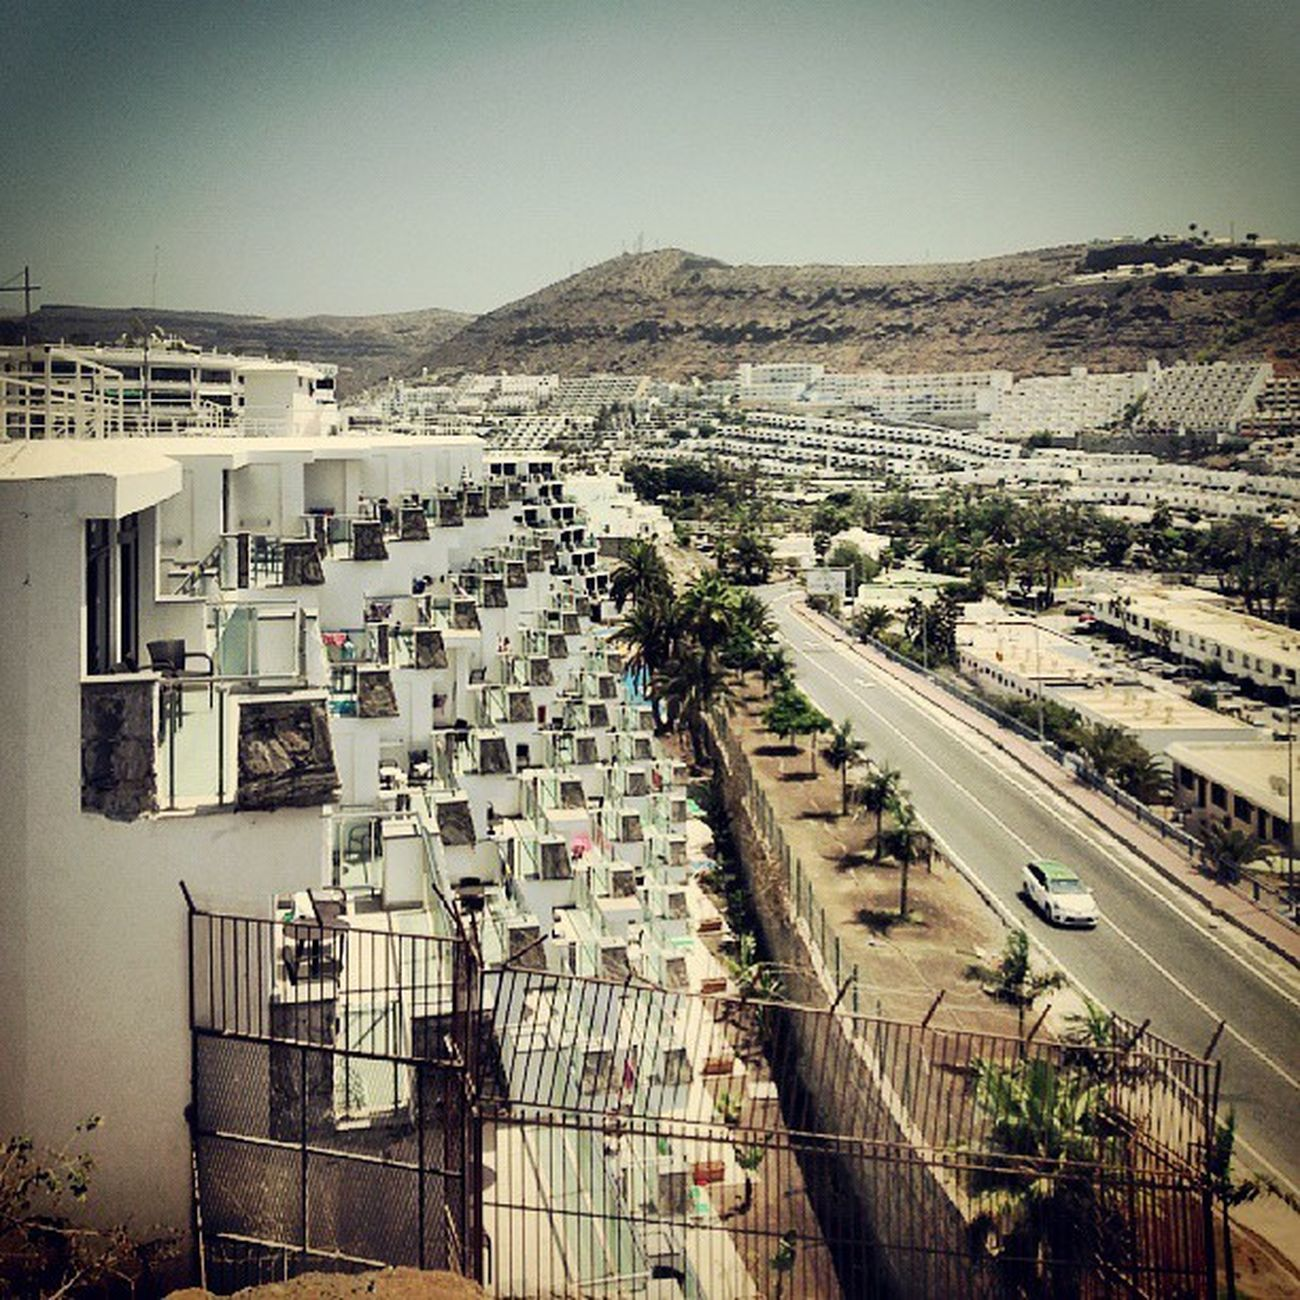 Puertorico Mog án GranCanaria Islascanarias CanaryIslands Canarias CanariasViva Canariasgrafías Taxi Road Carretera Apartment Igers IgersOfTheDay IgersLasPalmas IgersLpa IgersCanarias Instagramers Instalike LikeForLike PicOfTheDay PhotoOfTheDay FotoDelDía BestOfTheDay